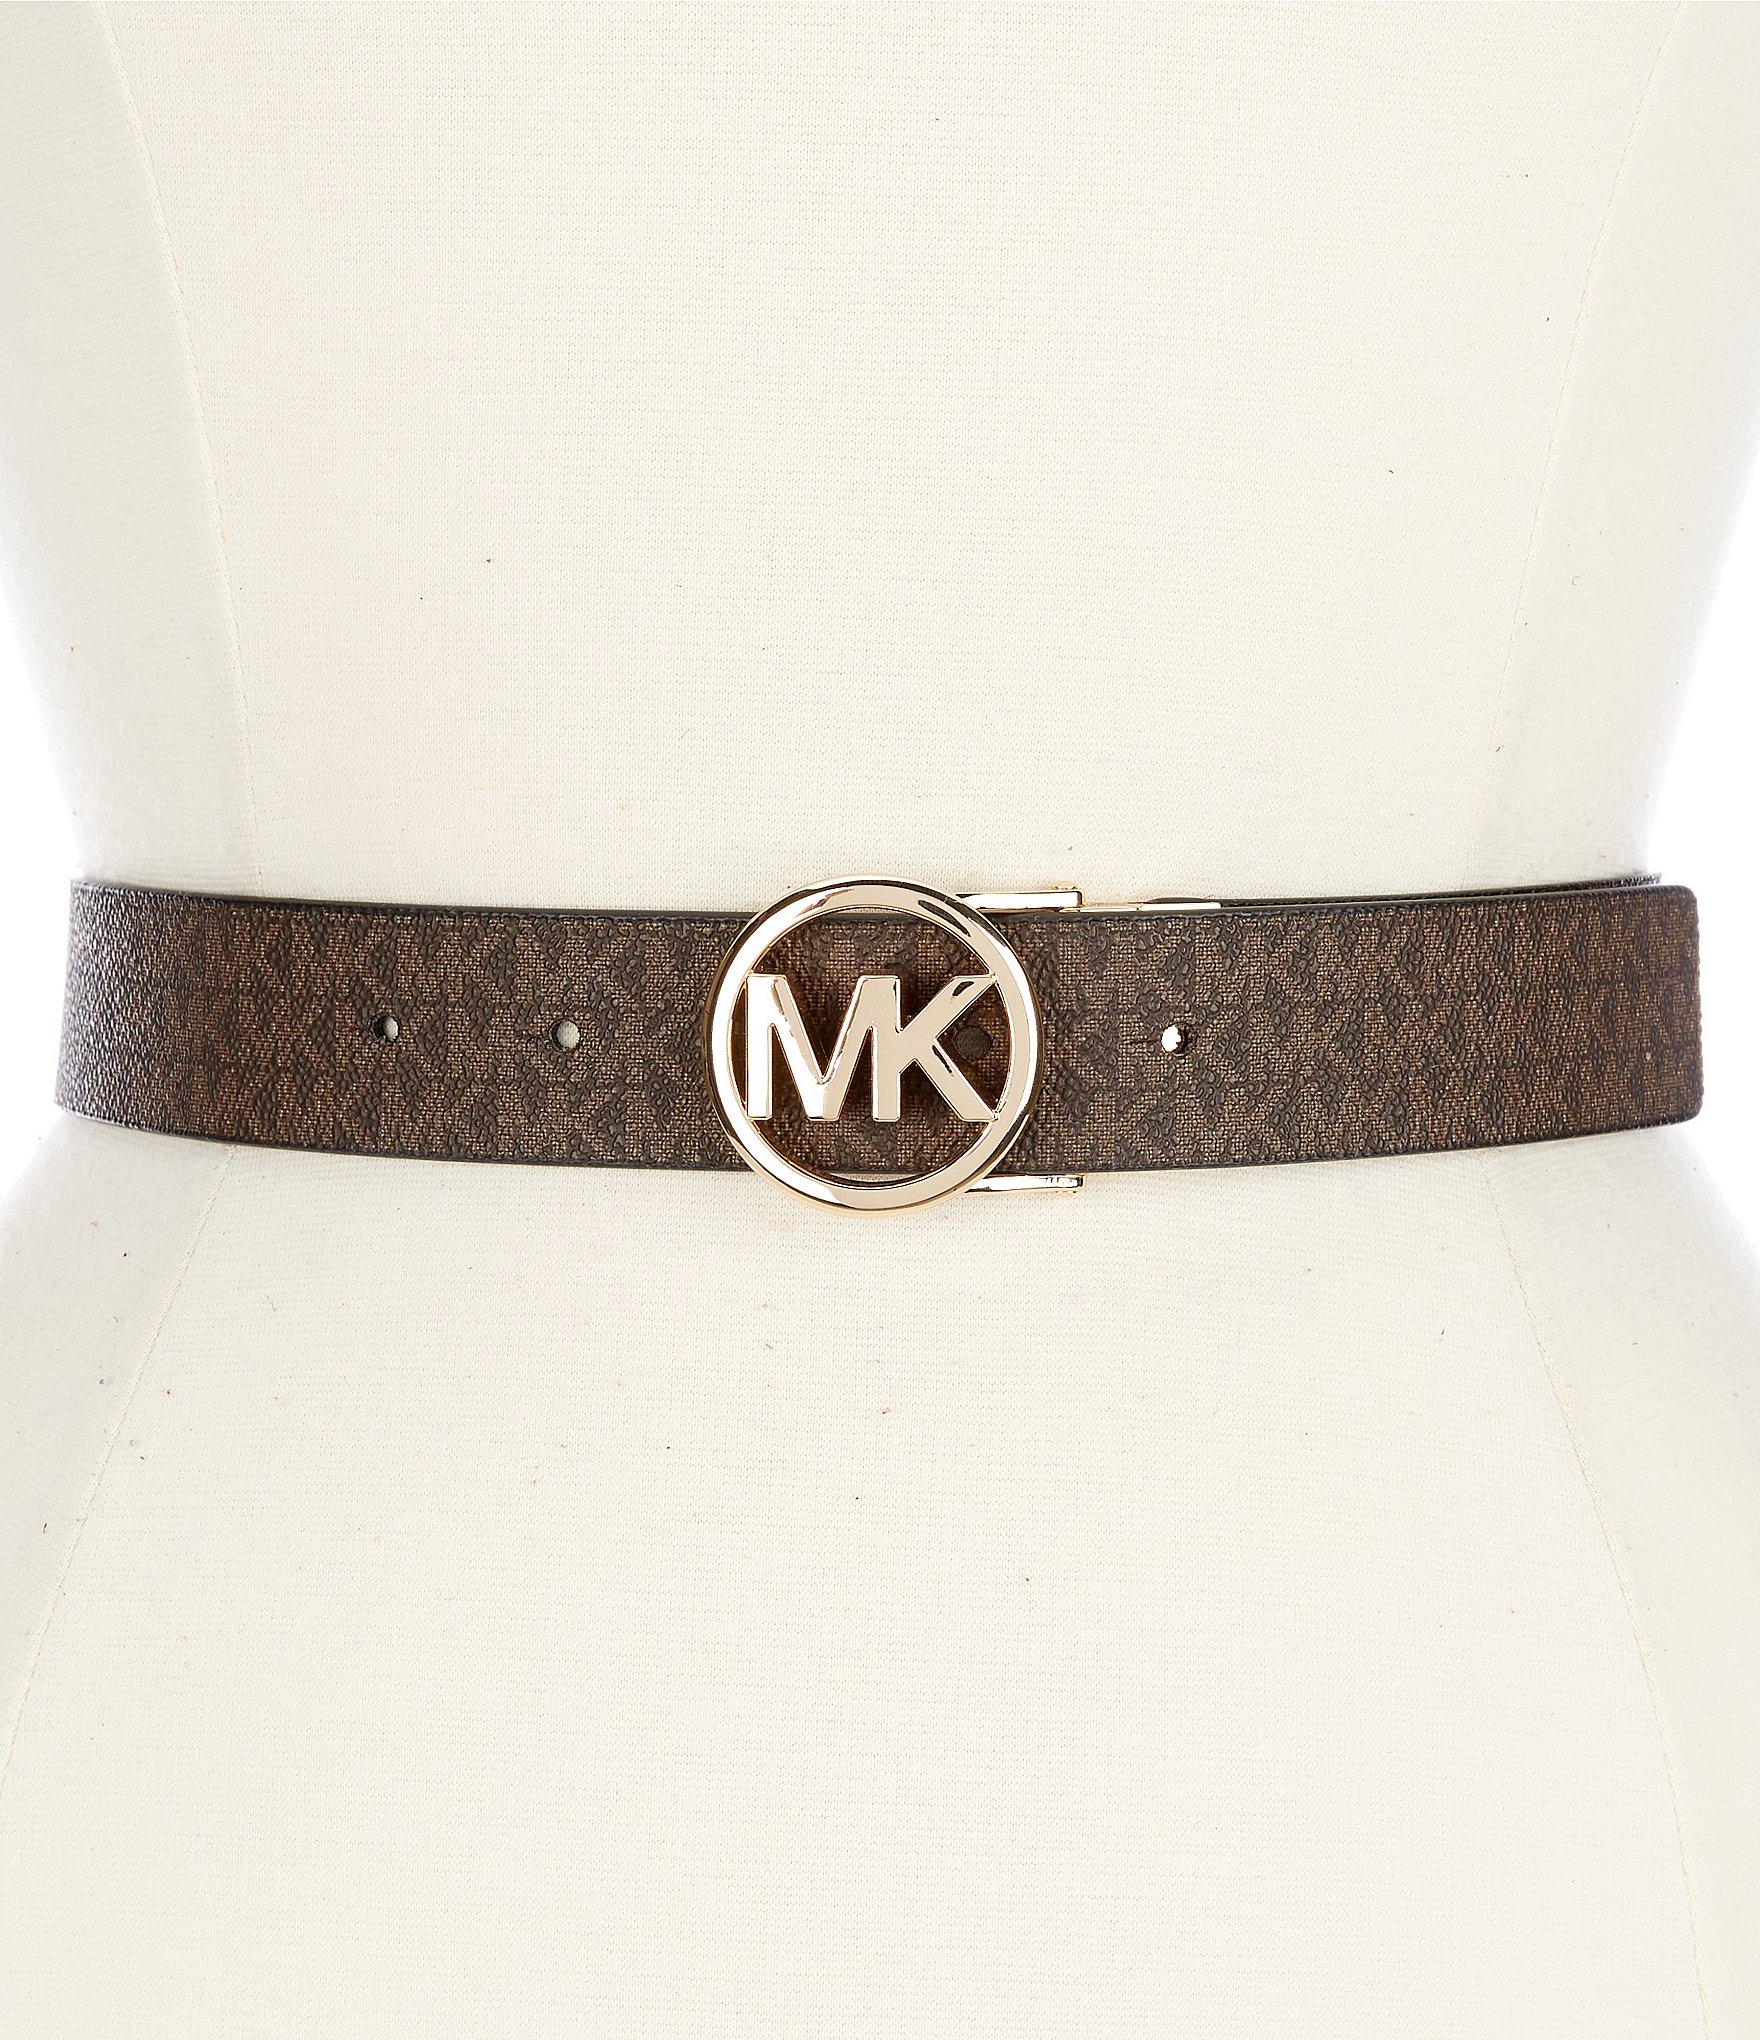 25b493a97c3c9 Michael Kors Women's Classic Belts | Dillard's